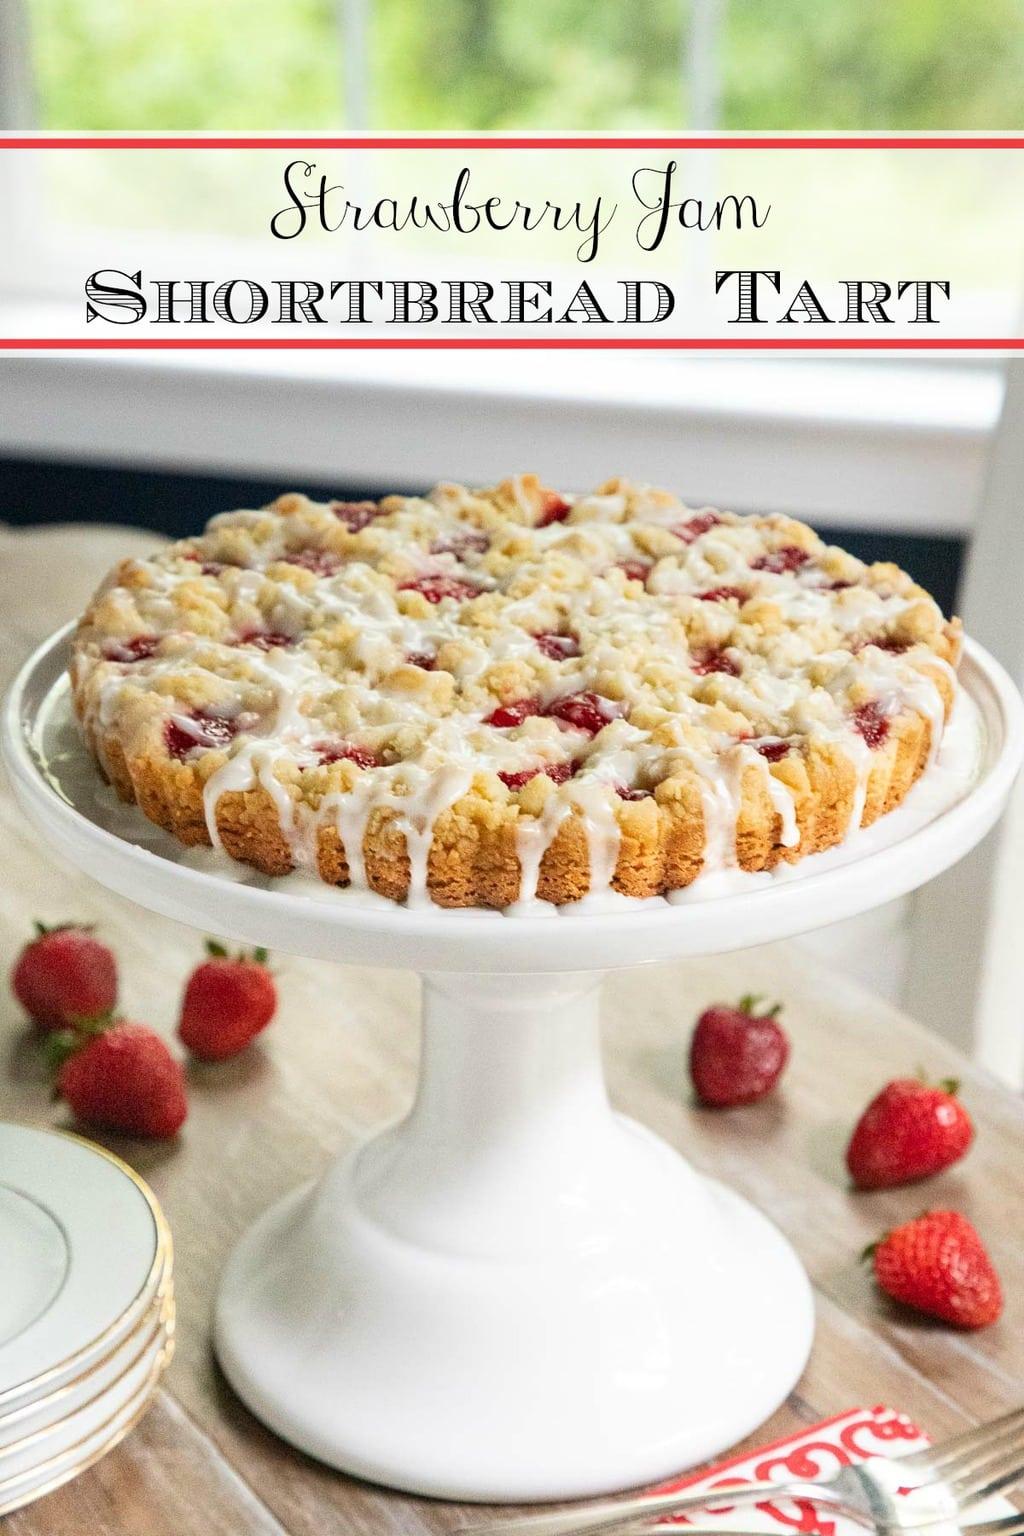 Strawberry Jam Shortbread Tart